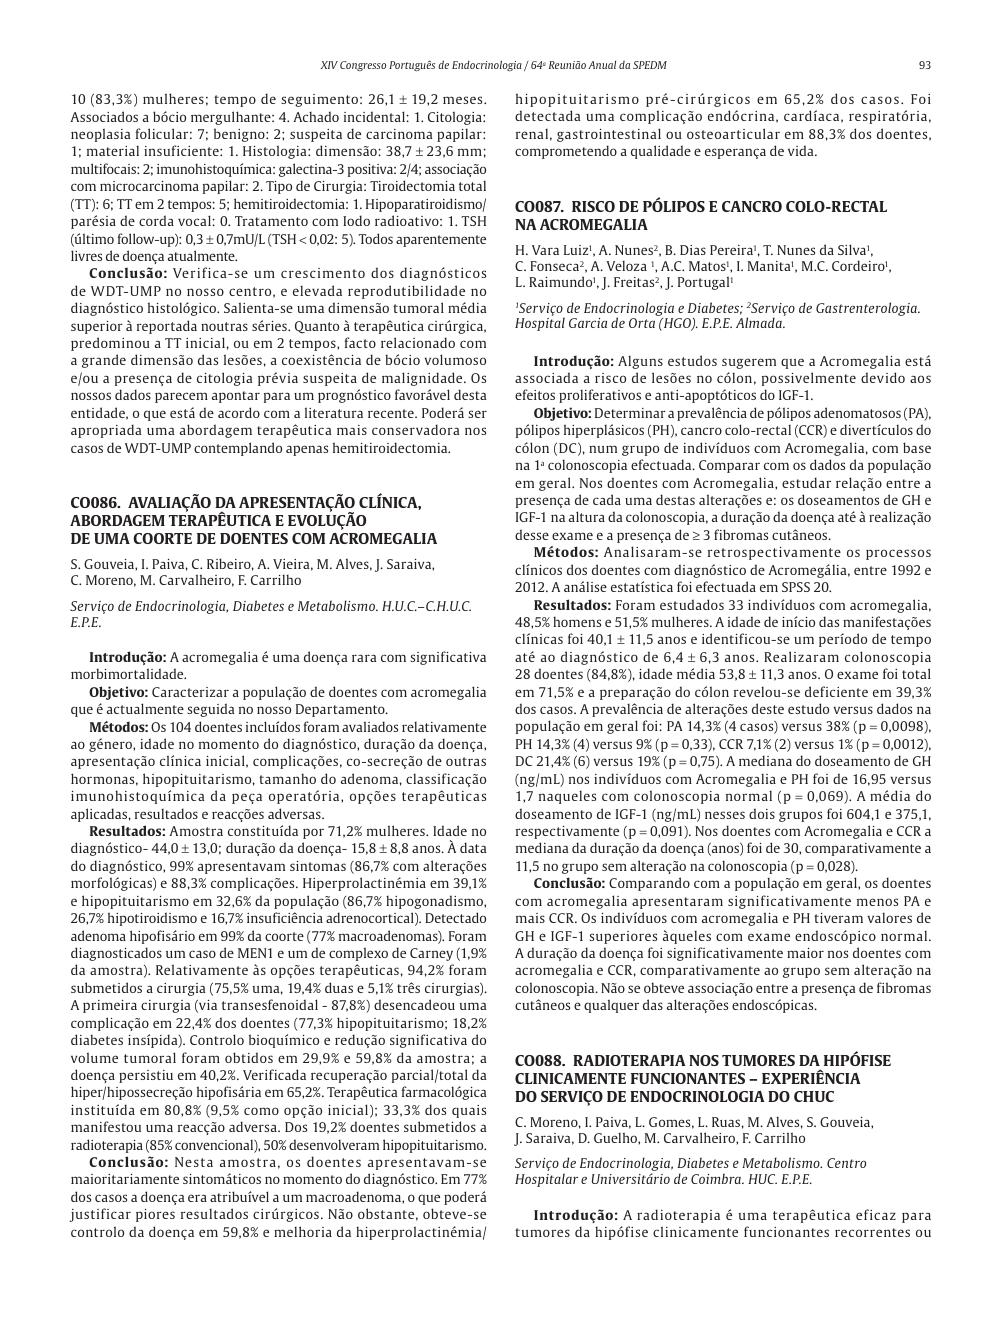 hipopituitarismo sintomas de diabetes